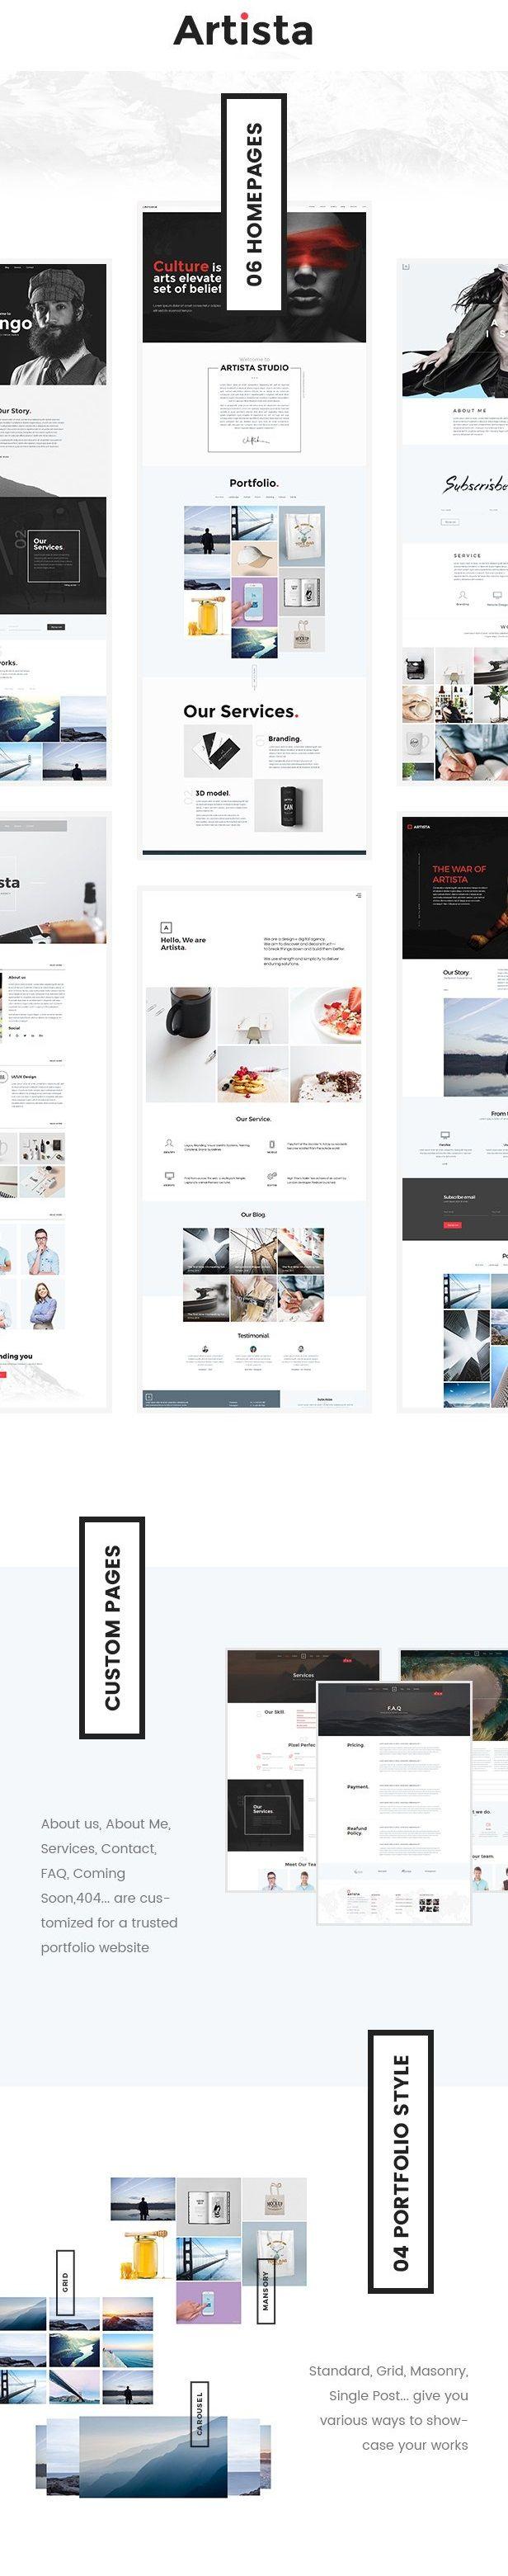 79 Best 3d Printing Images On Pinterest Wordpress Template And Flexible Circuit Board Filacart Blog Megastore Artista Responsive Multi Purpose Creative Portfolio Theme By Zotheme